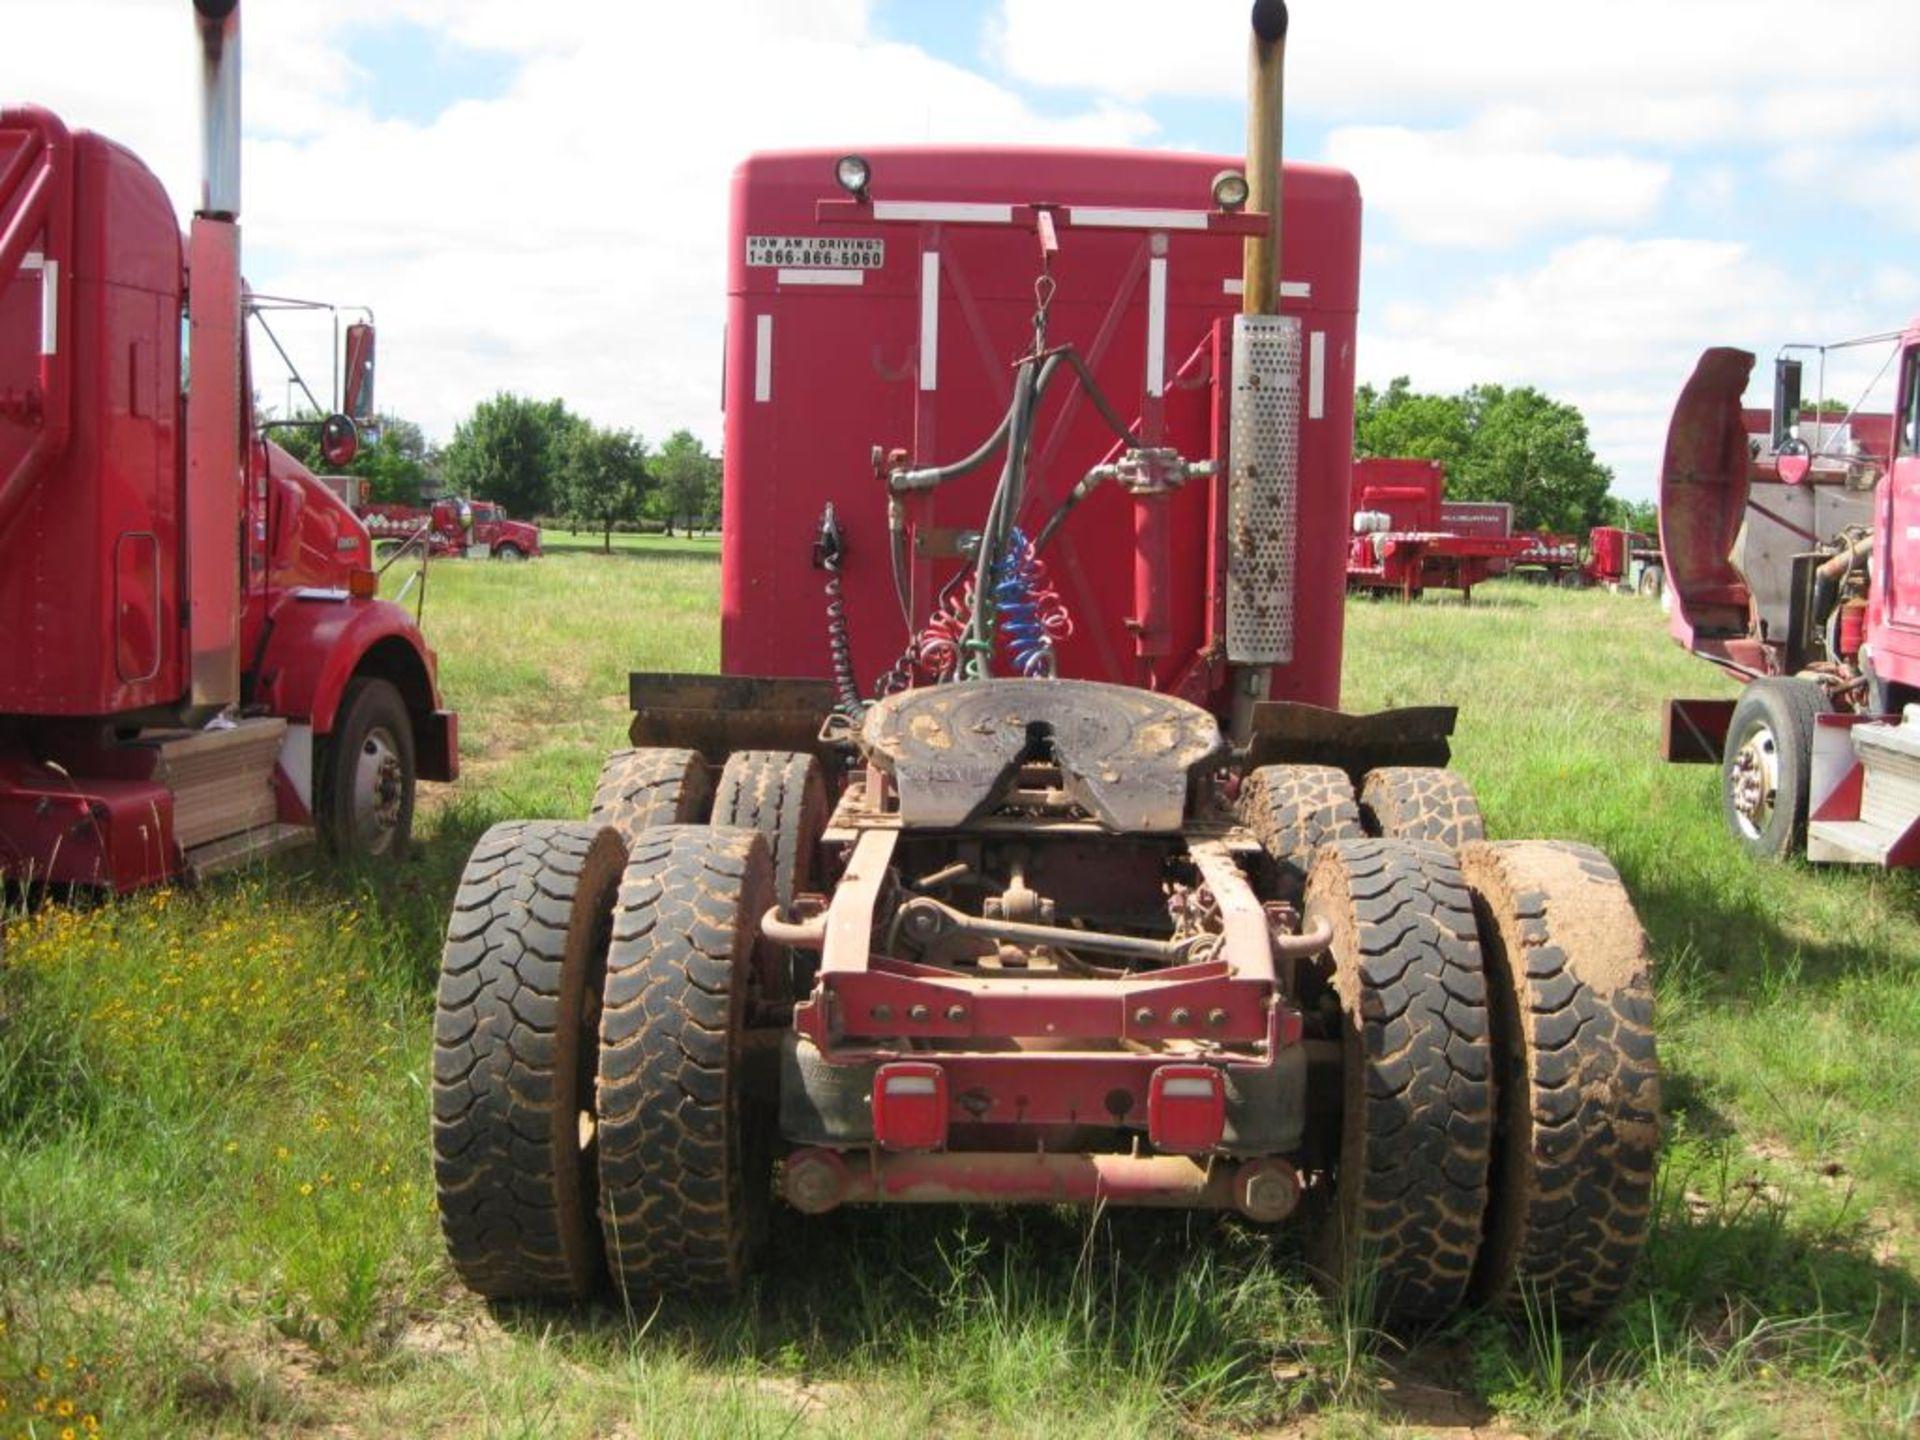 Kenworth Truck - Image 6 of 20